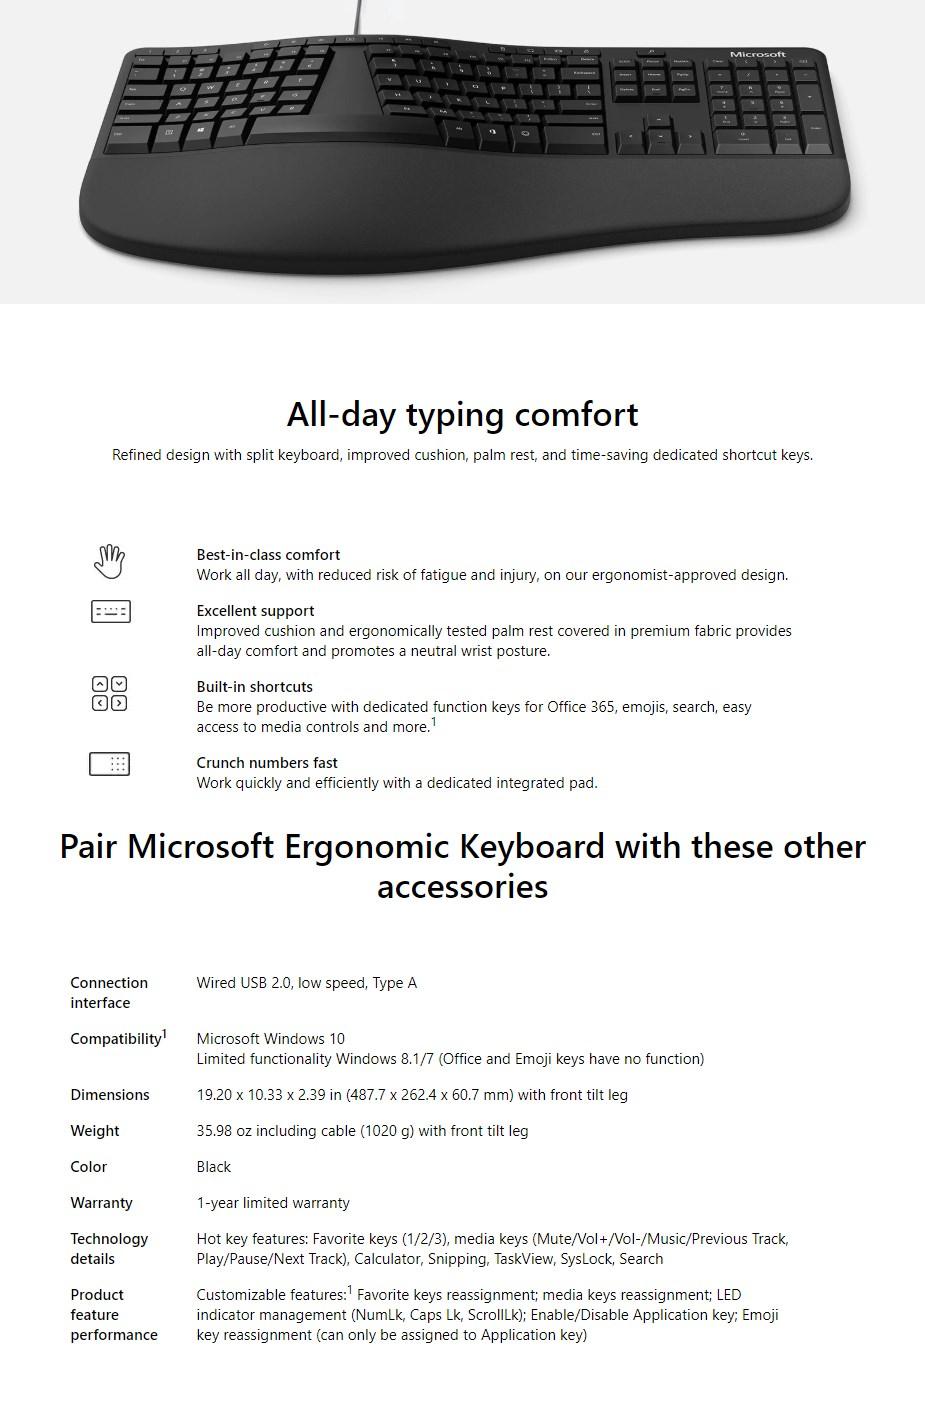 microsoft-ergonomic-ke3yboard-black-ac31952.jpg